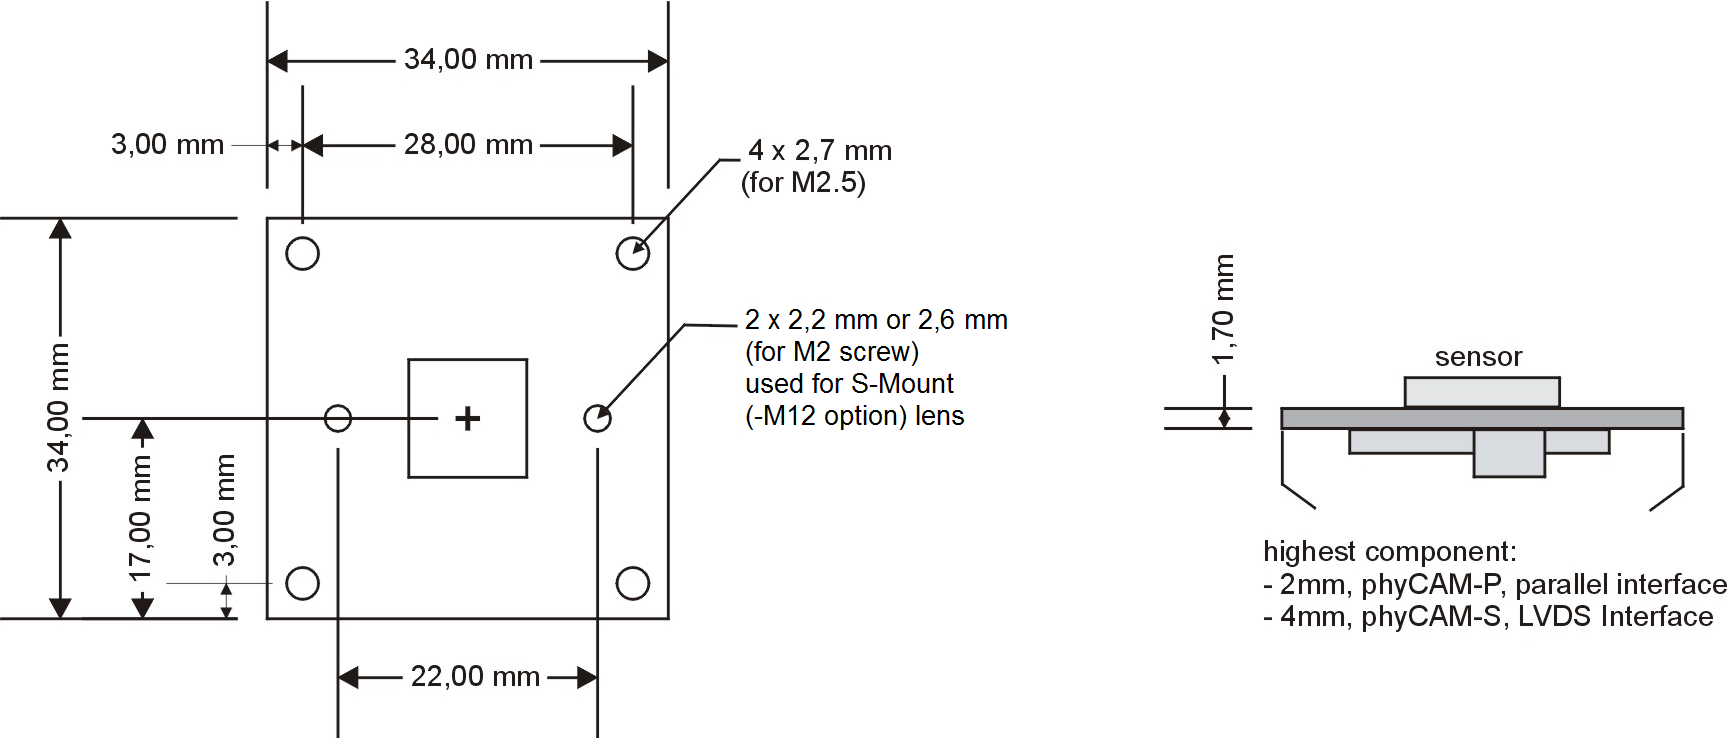 phyCAM Printed Circuit Board (PCB) Dimensions